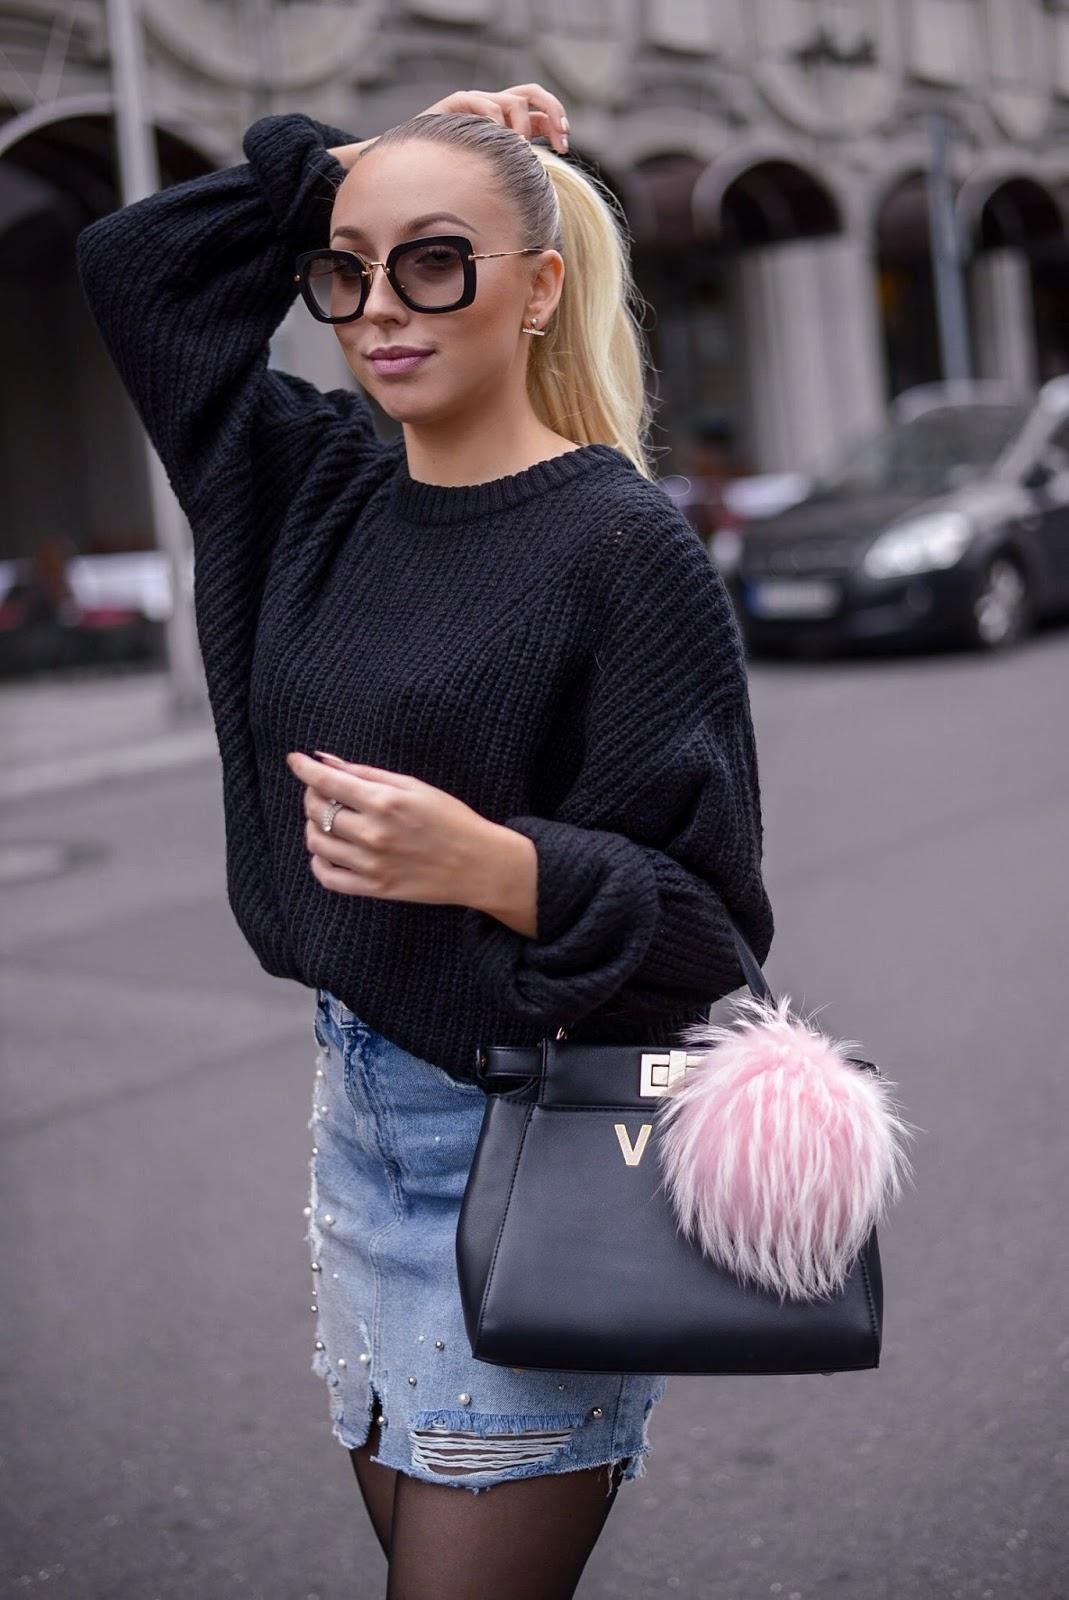 black chunky knit sweater_fendi peekaboo inspired bag_pink fur bag charm_fall looks